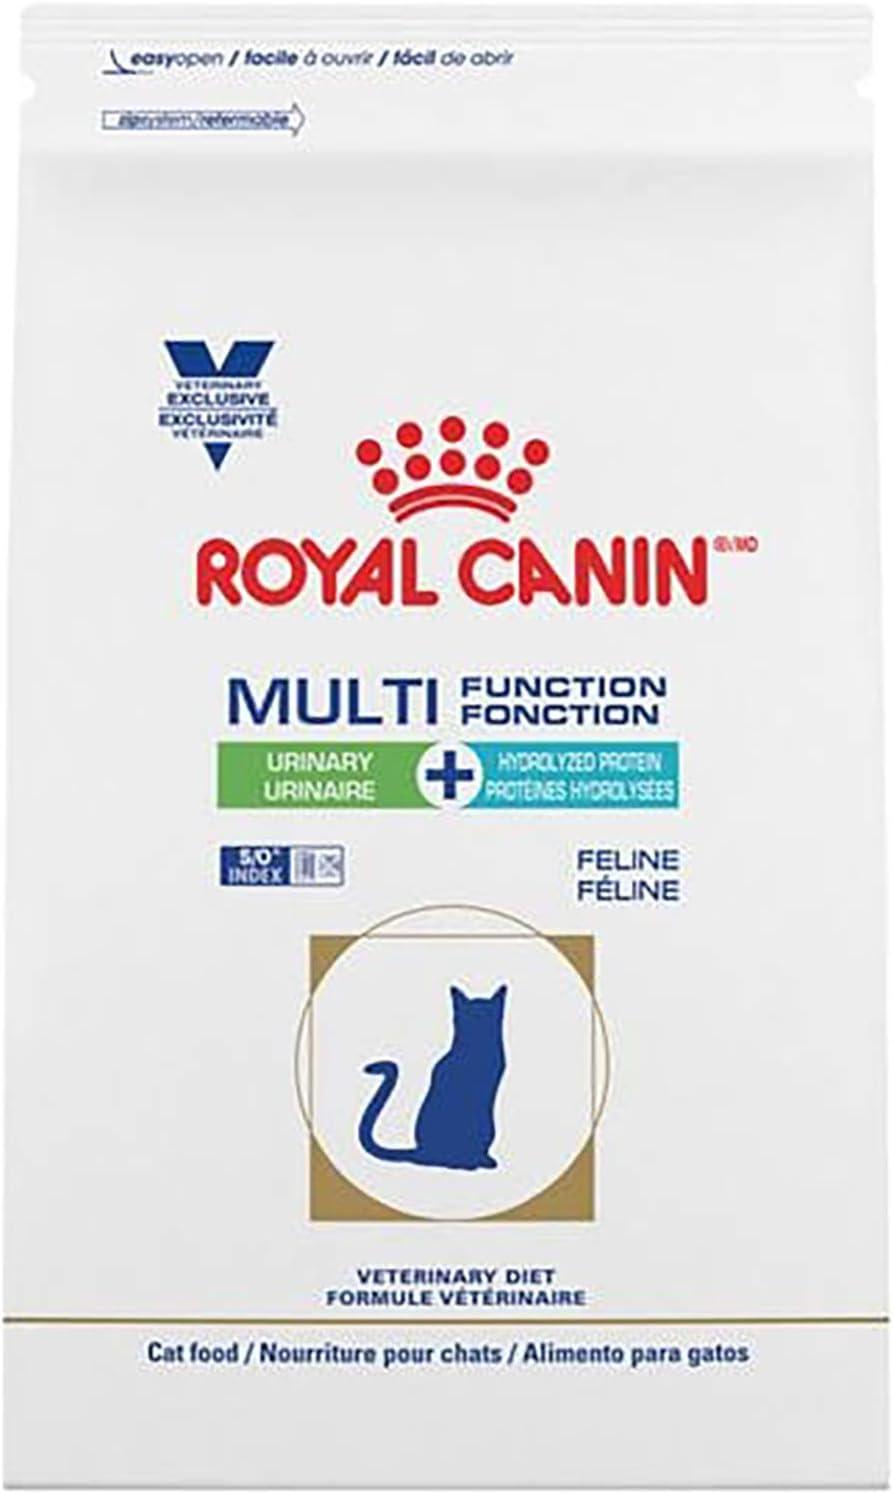 ROYAL CANIN Felina multifunción urinaria + proteína hidrolizada ...